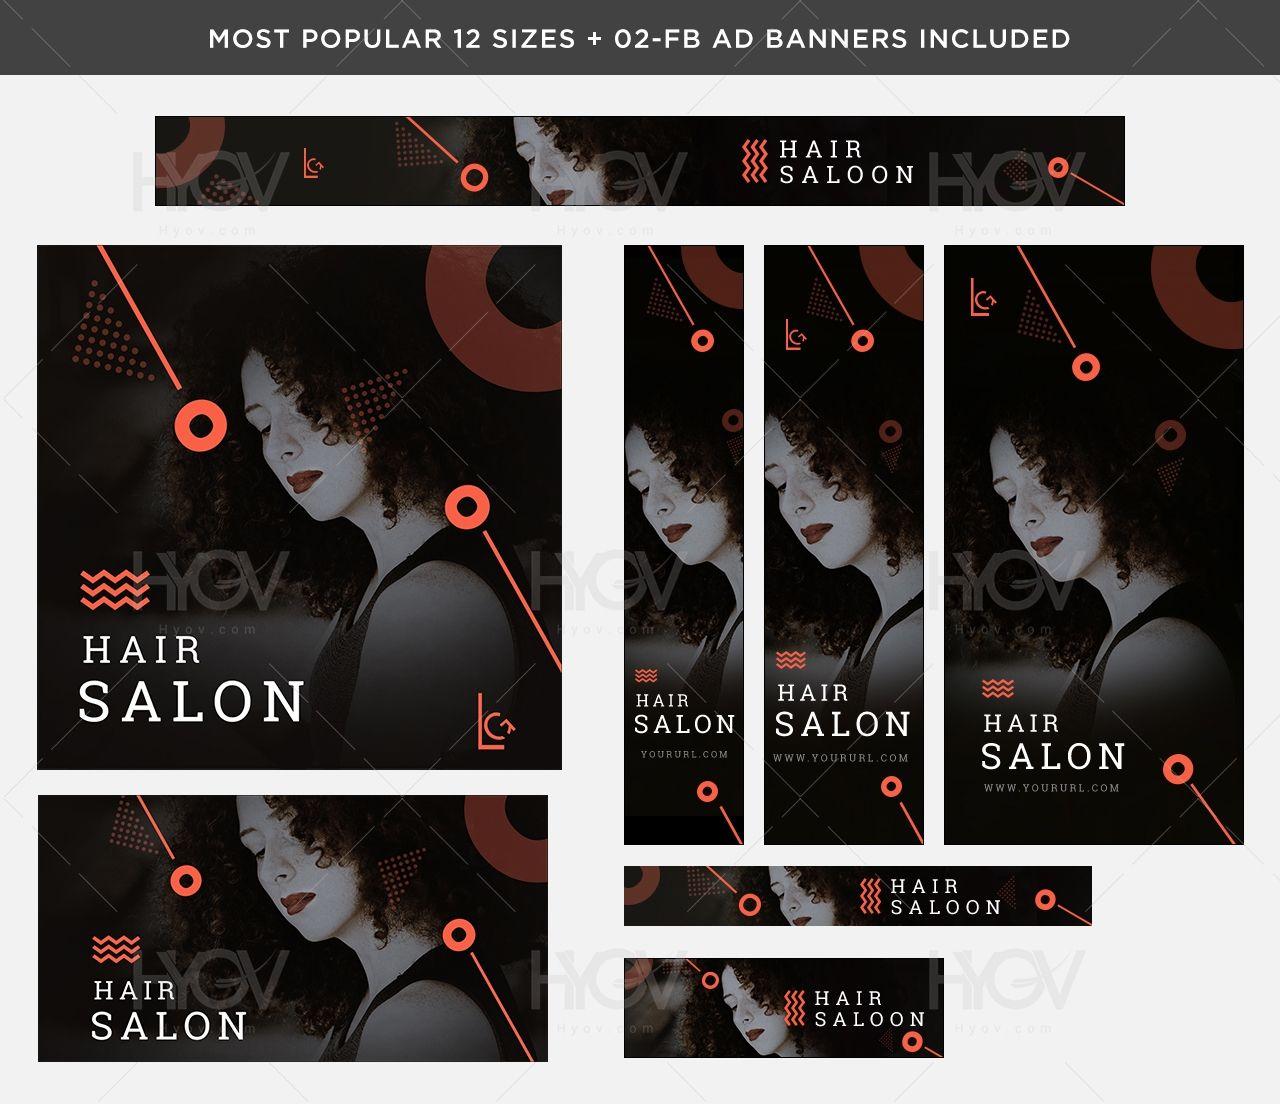 Hair Salon Banner Designs Banner Design Hair Salon Brands Hair Salon